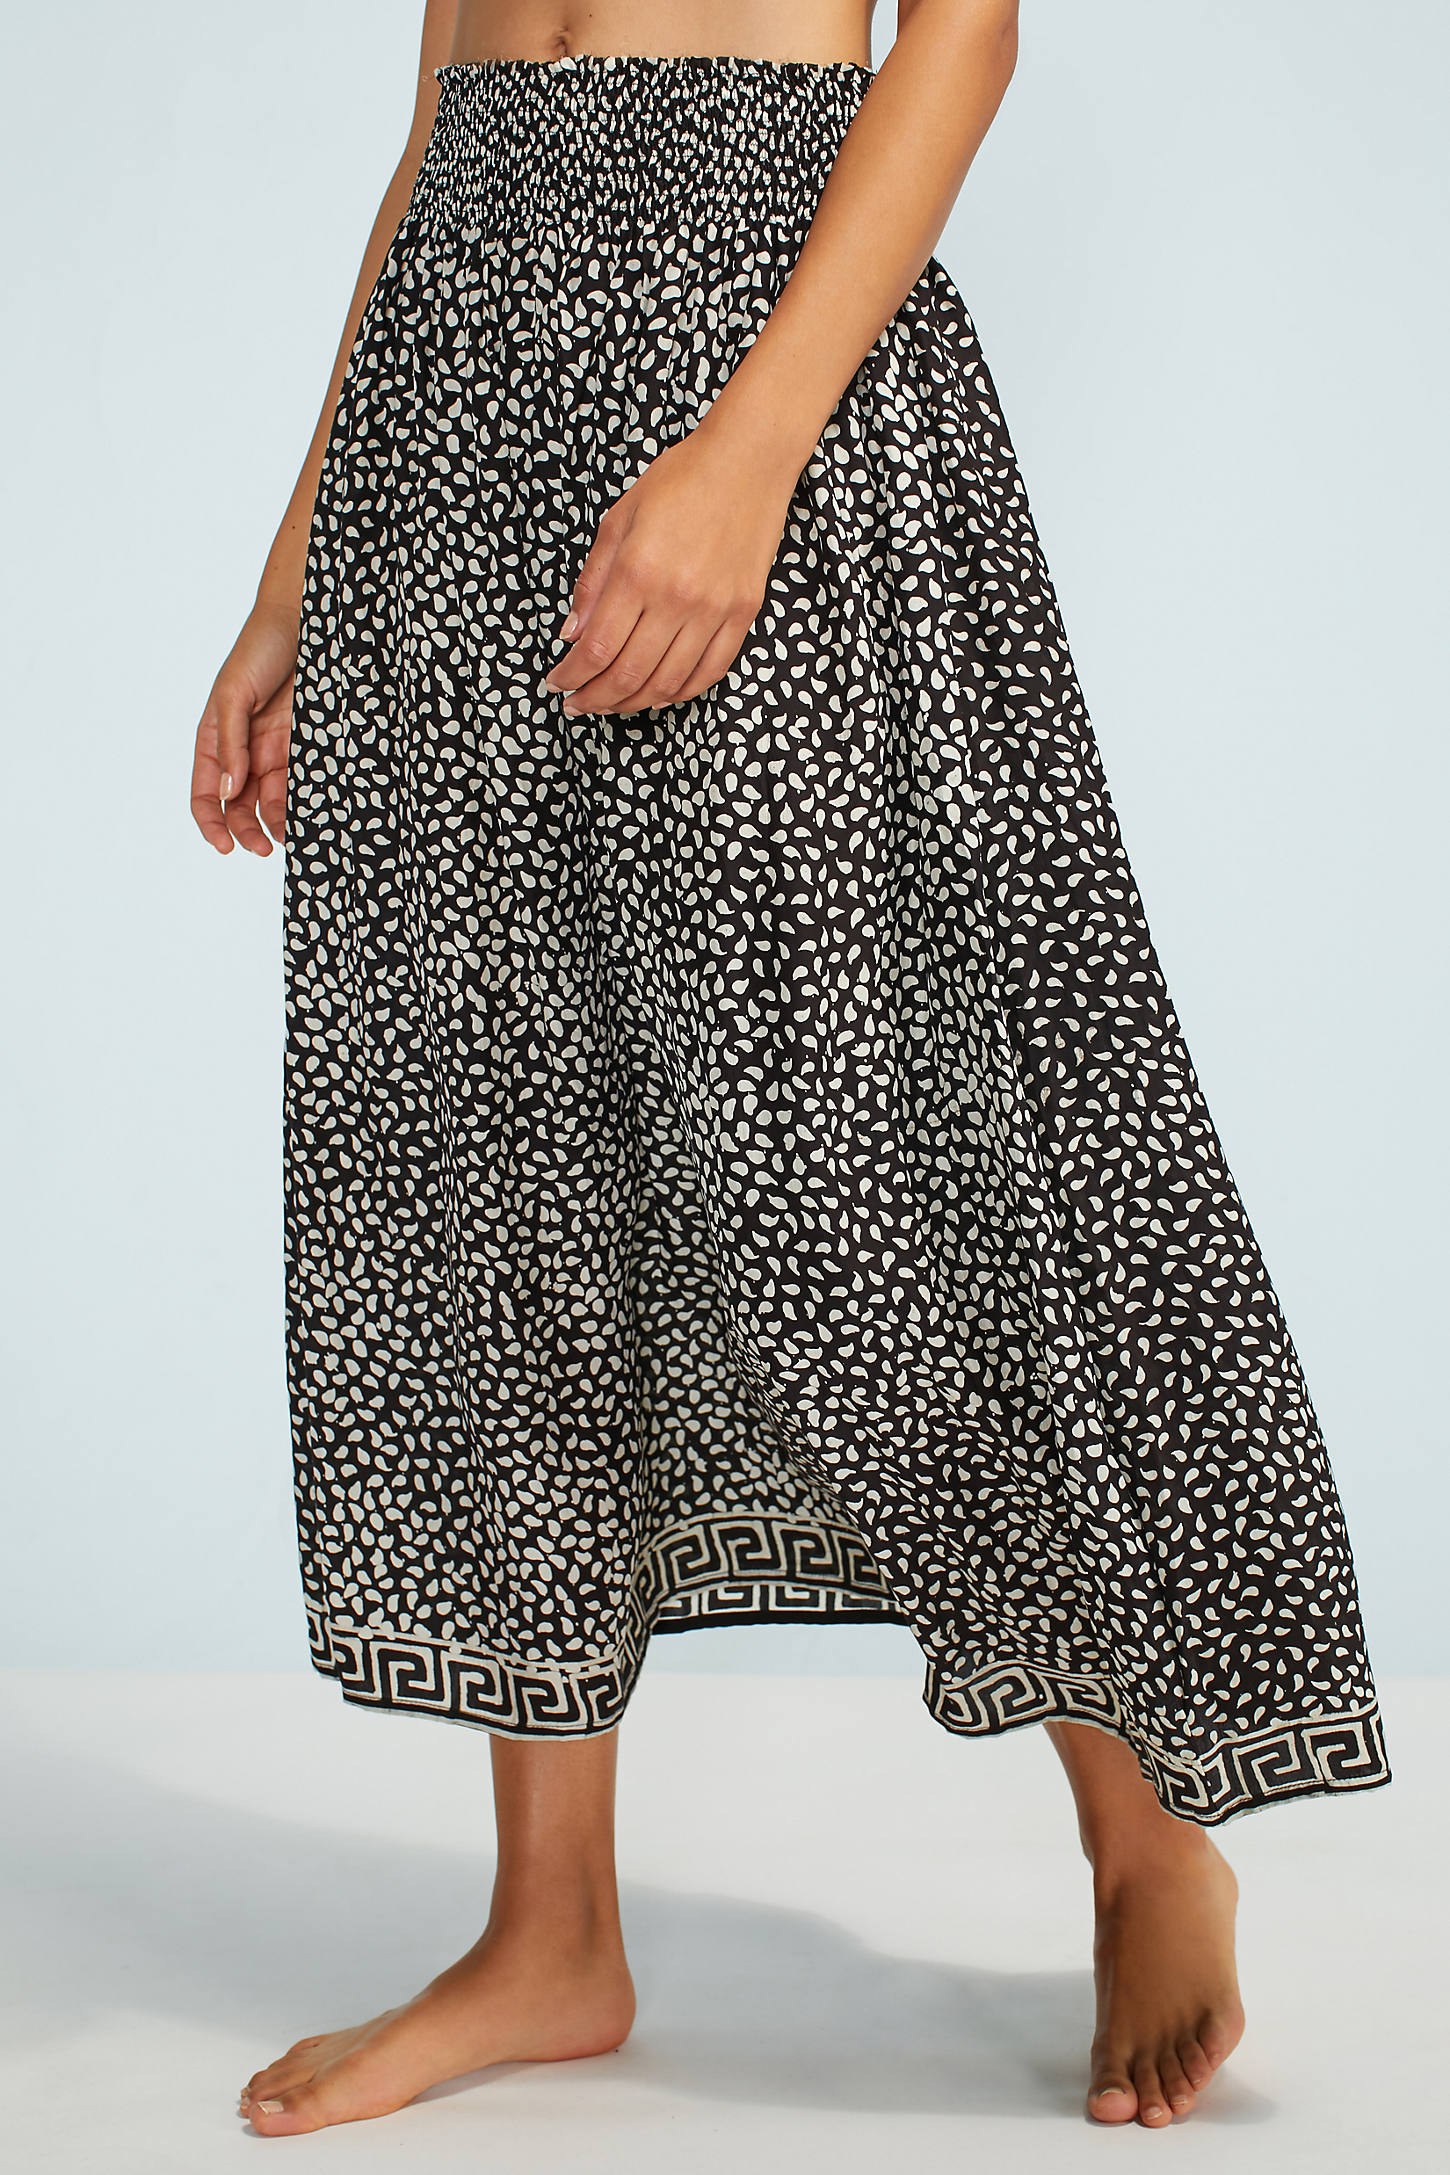 Natalie Martin Bella Silk Skirt